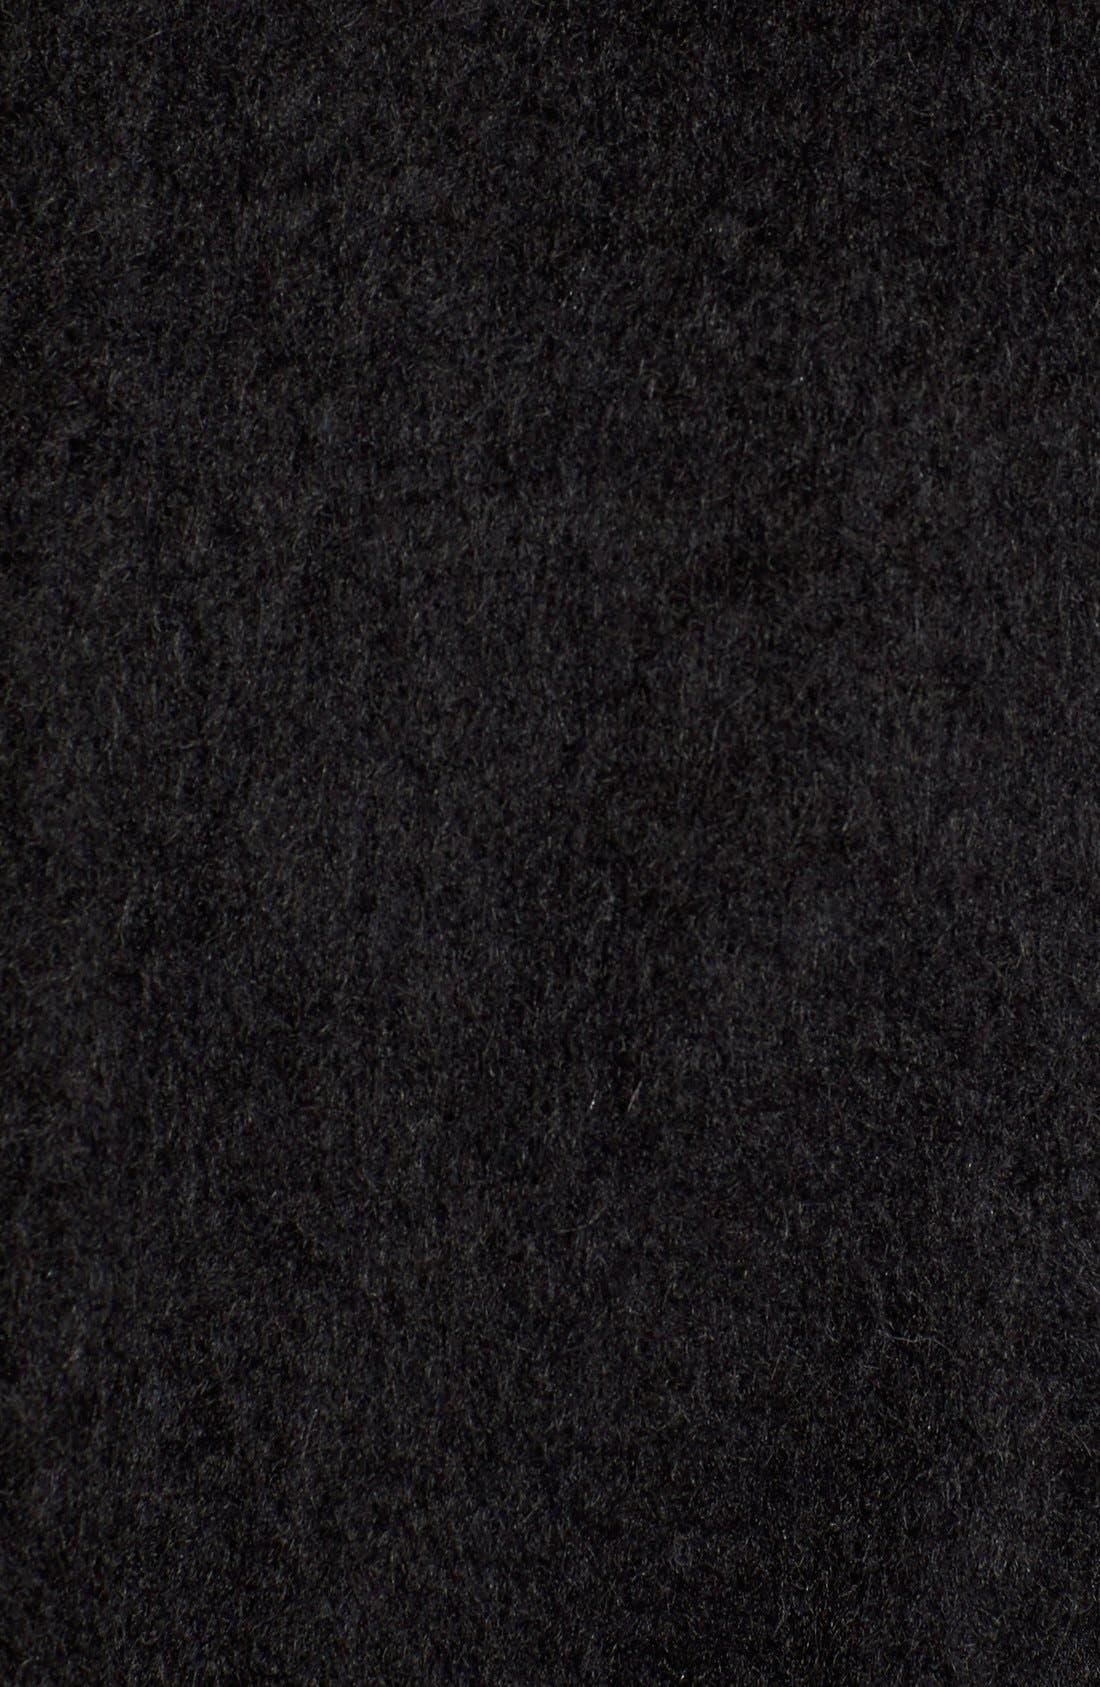 Brushed Wool Blend Fit & Flare Coat,                             Alternate thumbnail 5, color,